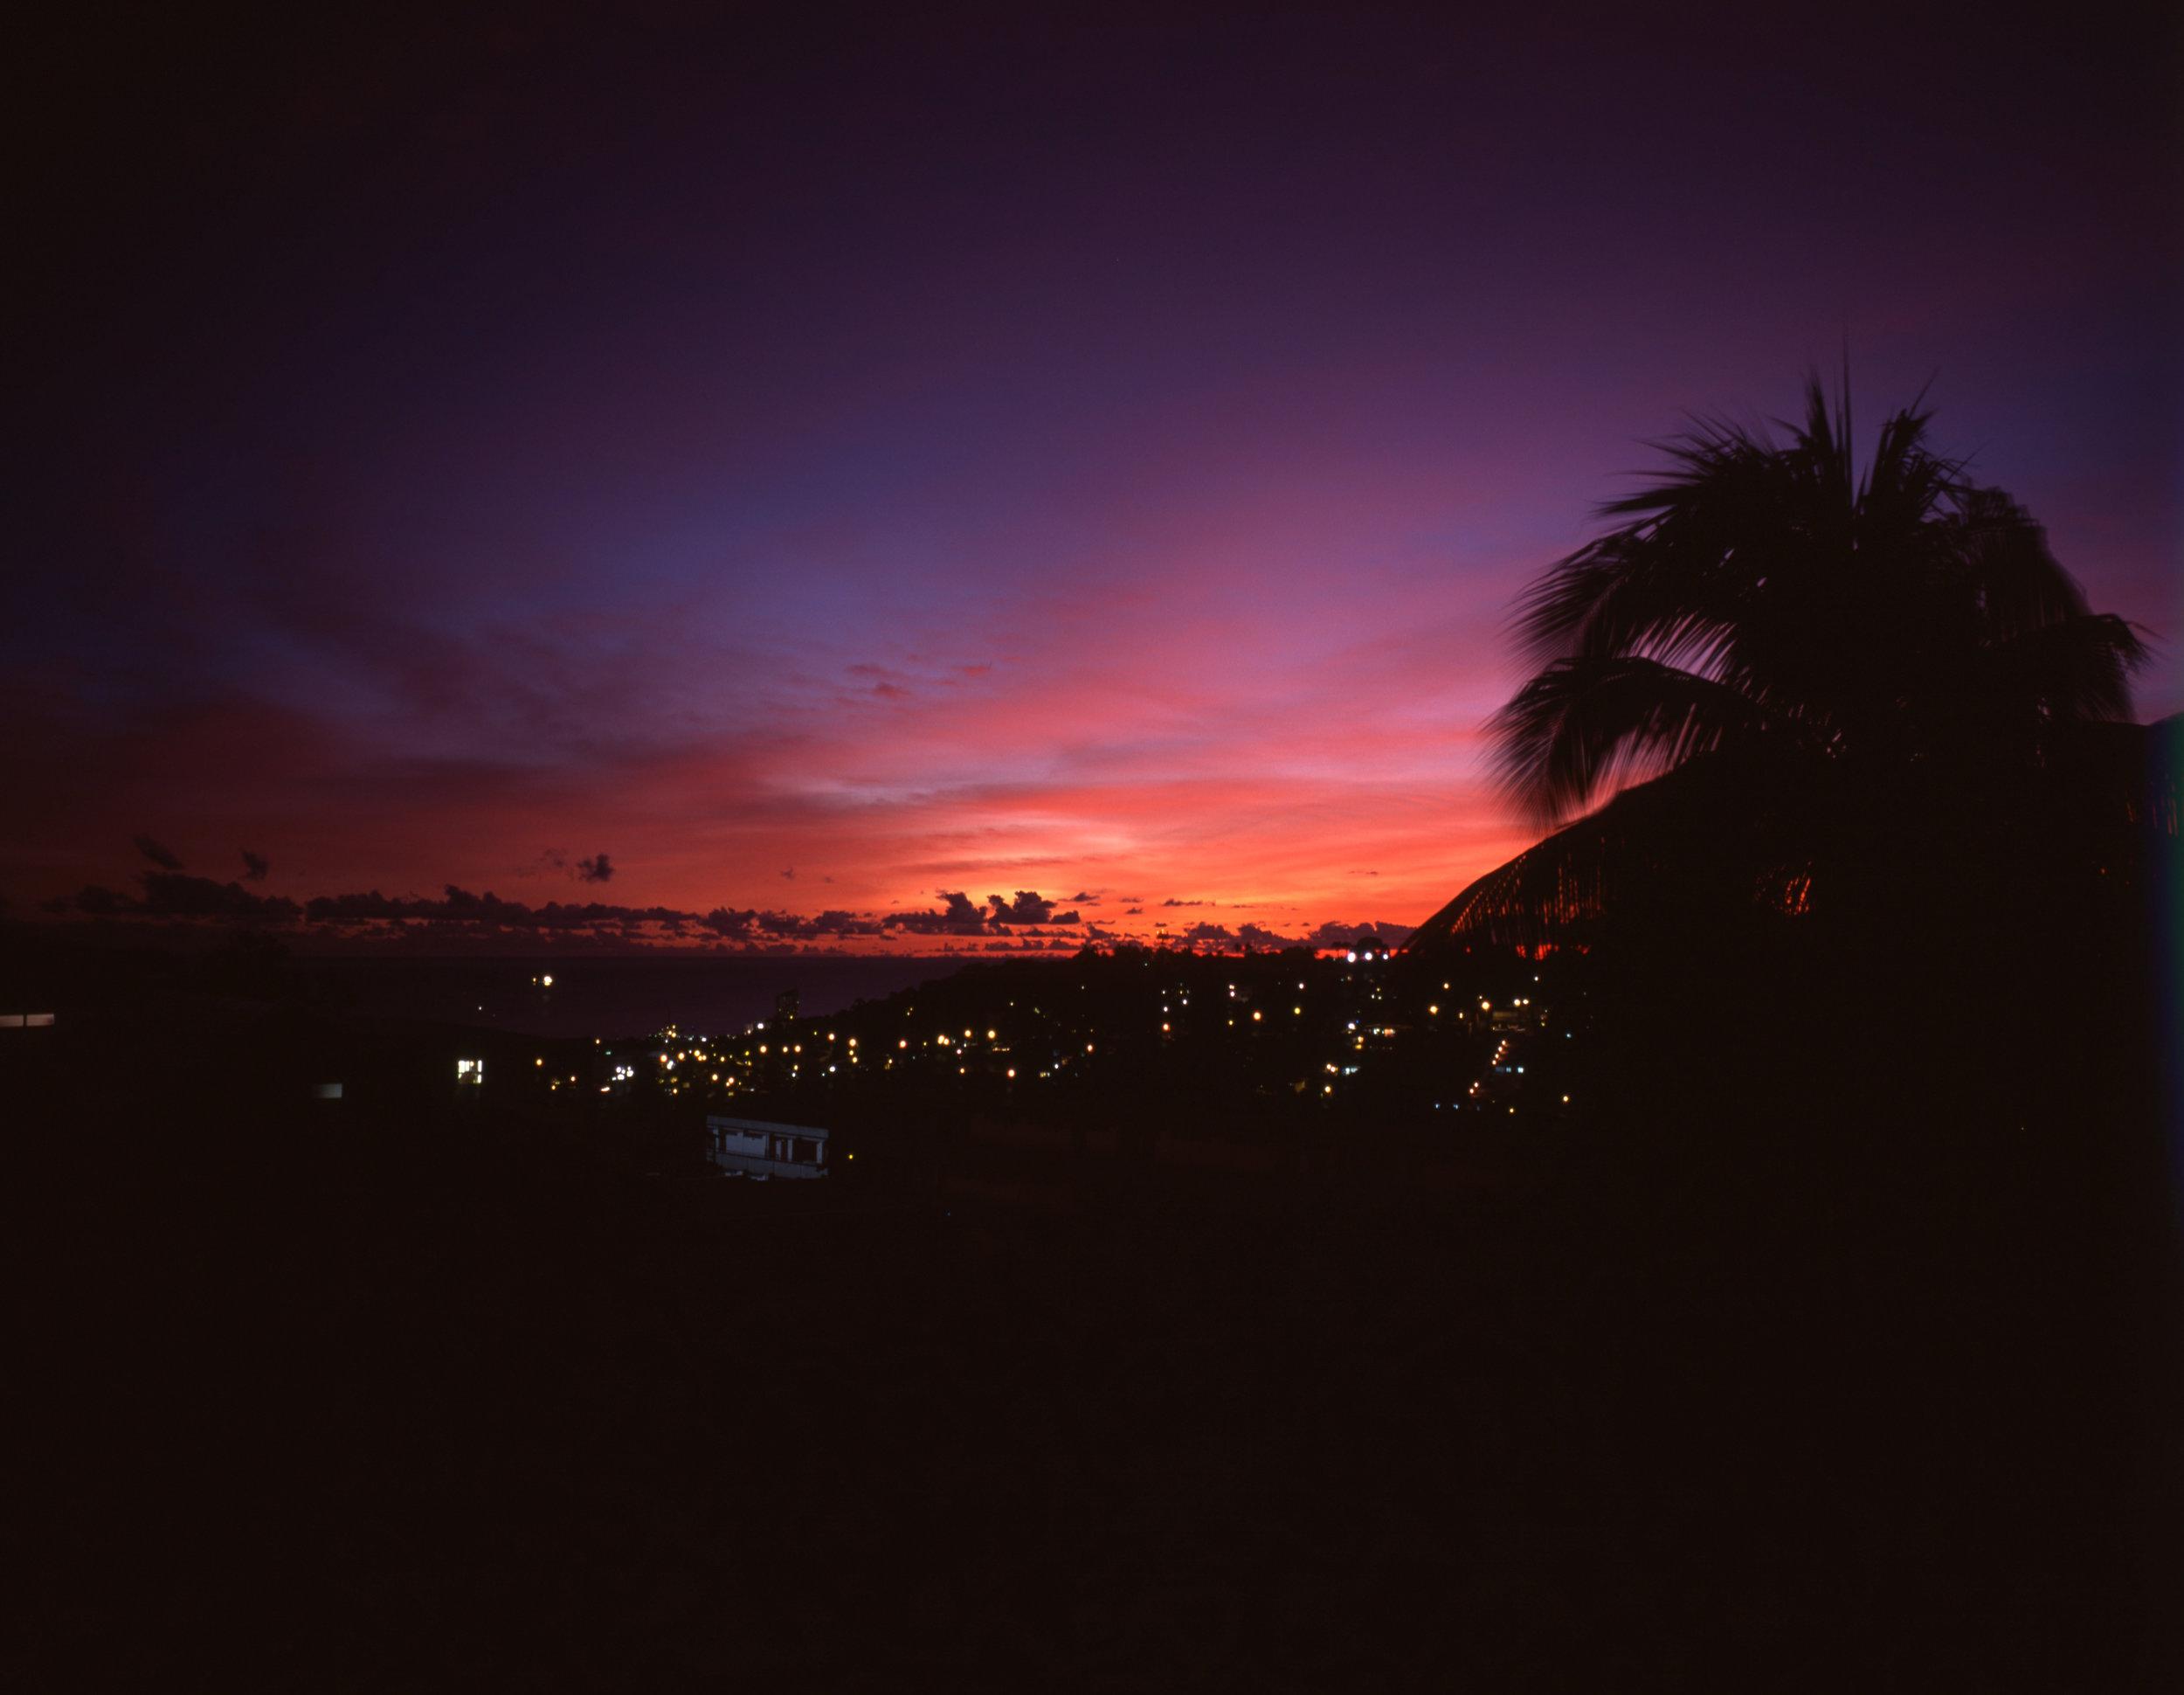 Fort De France Sunset on our last night Fuji GF670w | Fuji Velvia 50